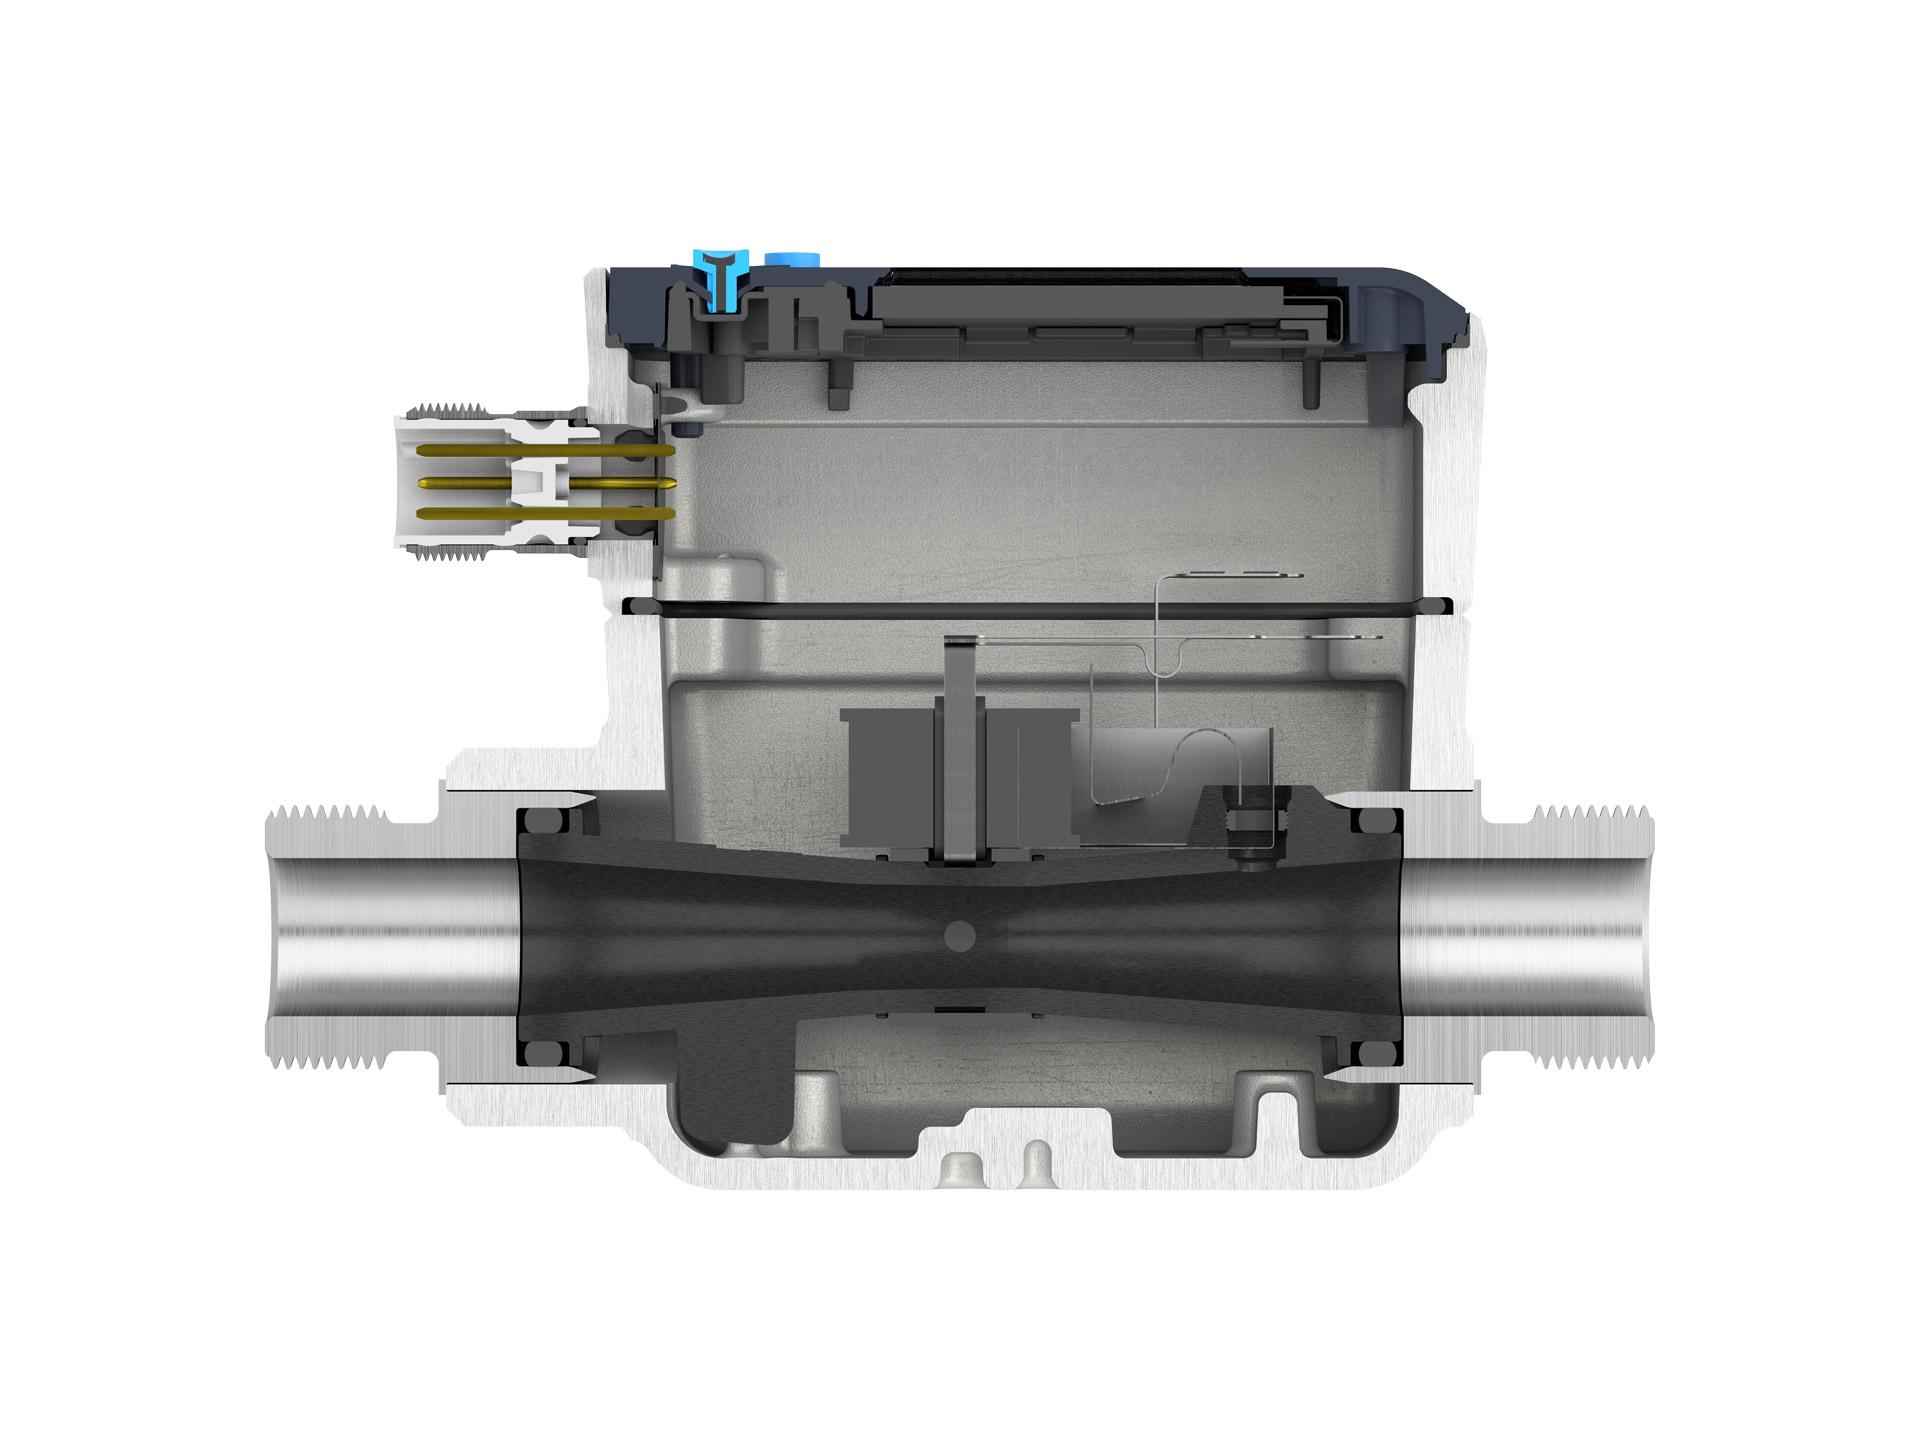 Round bore sensor design